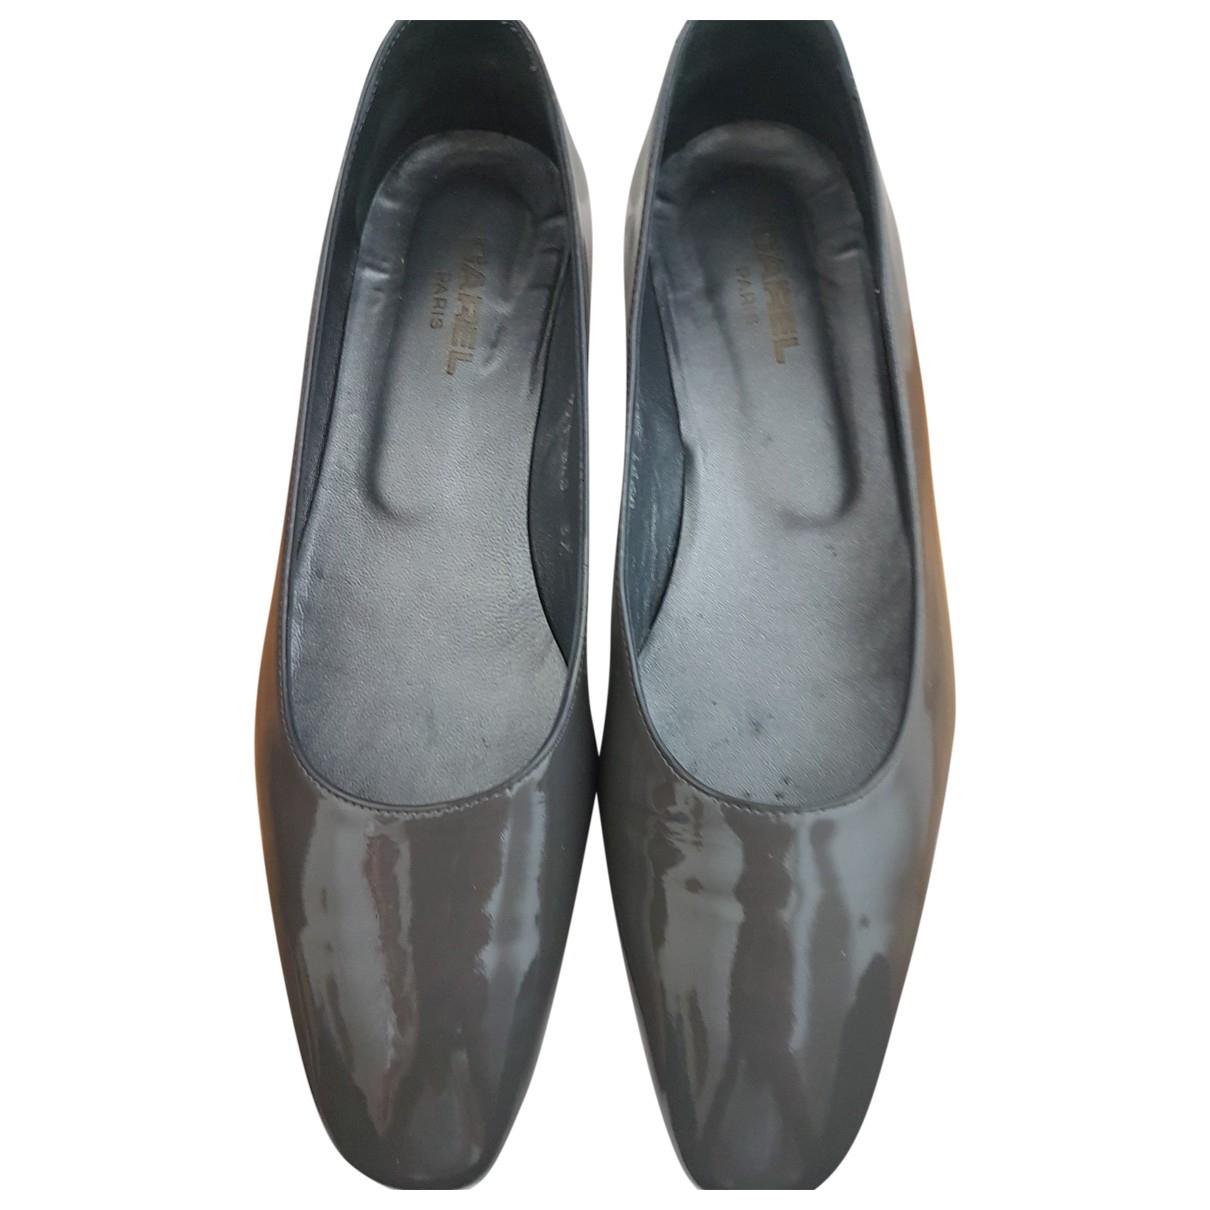 Carel \N Patent leather Ballet flats for Women 37 EU